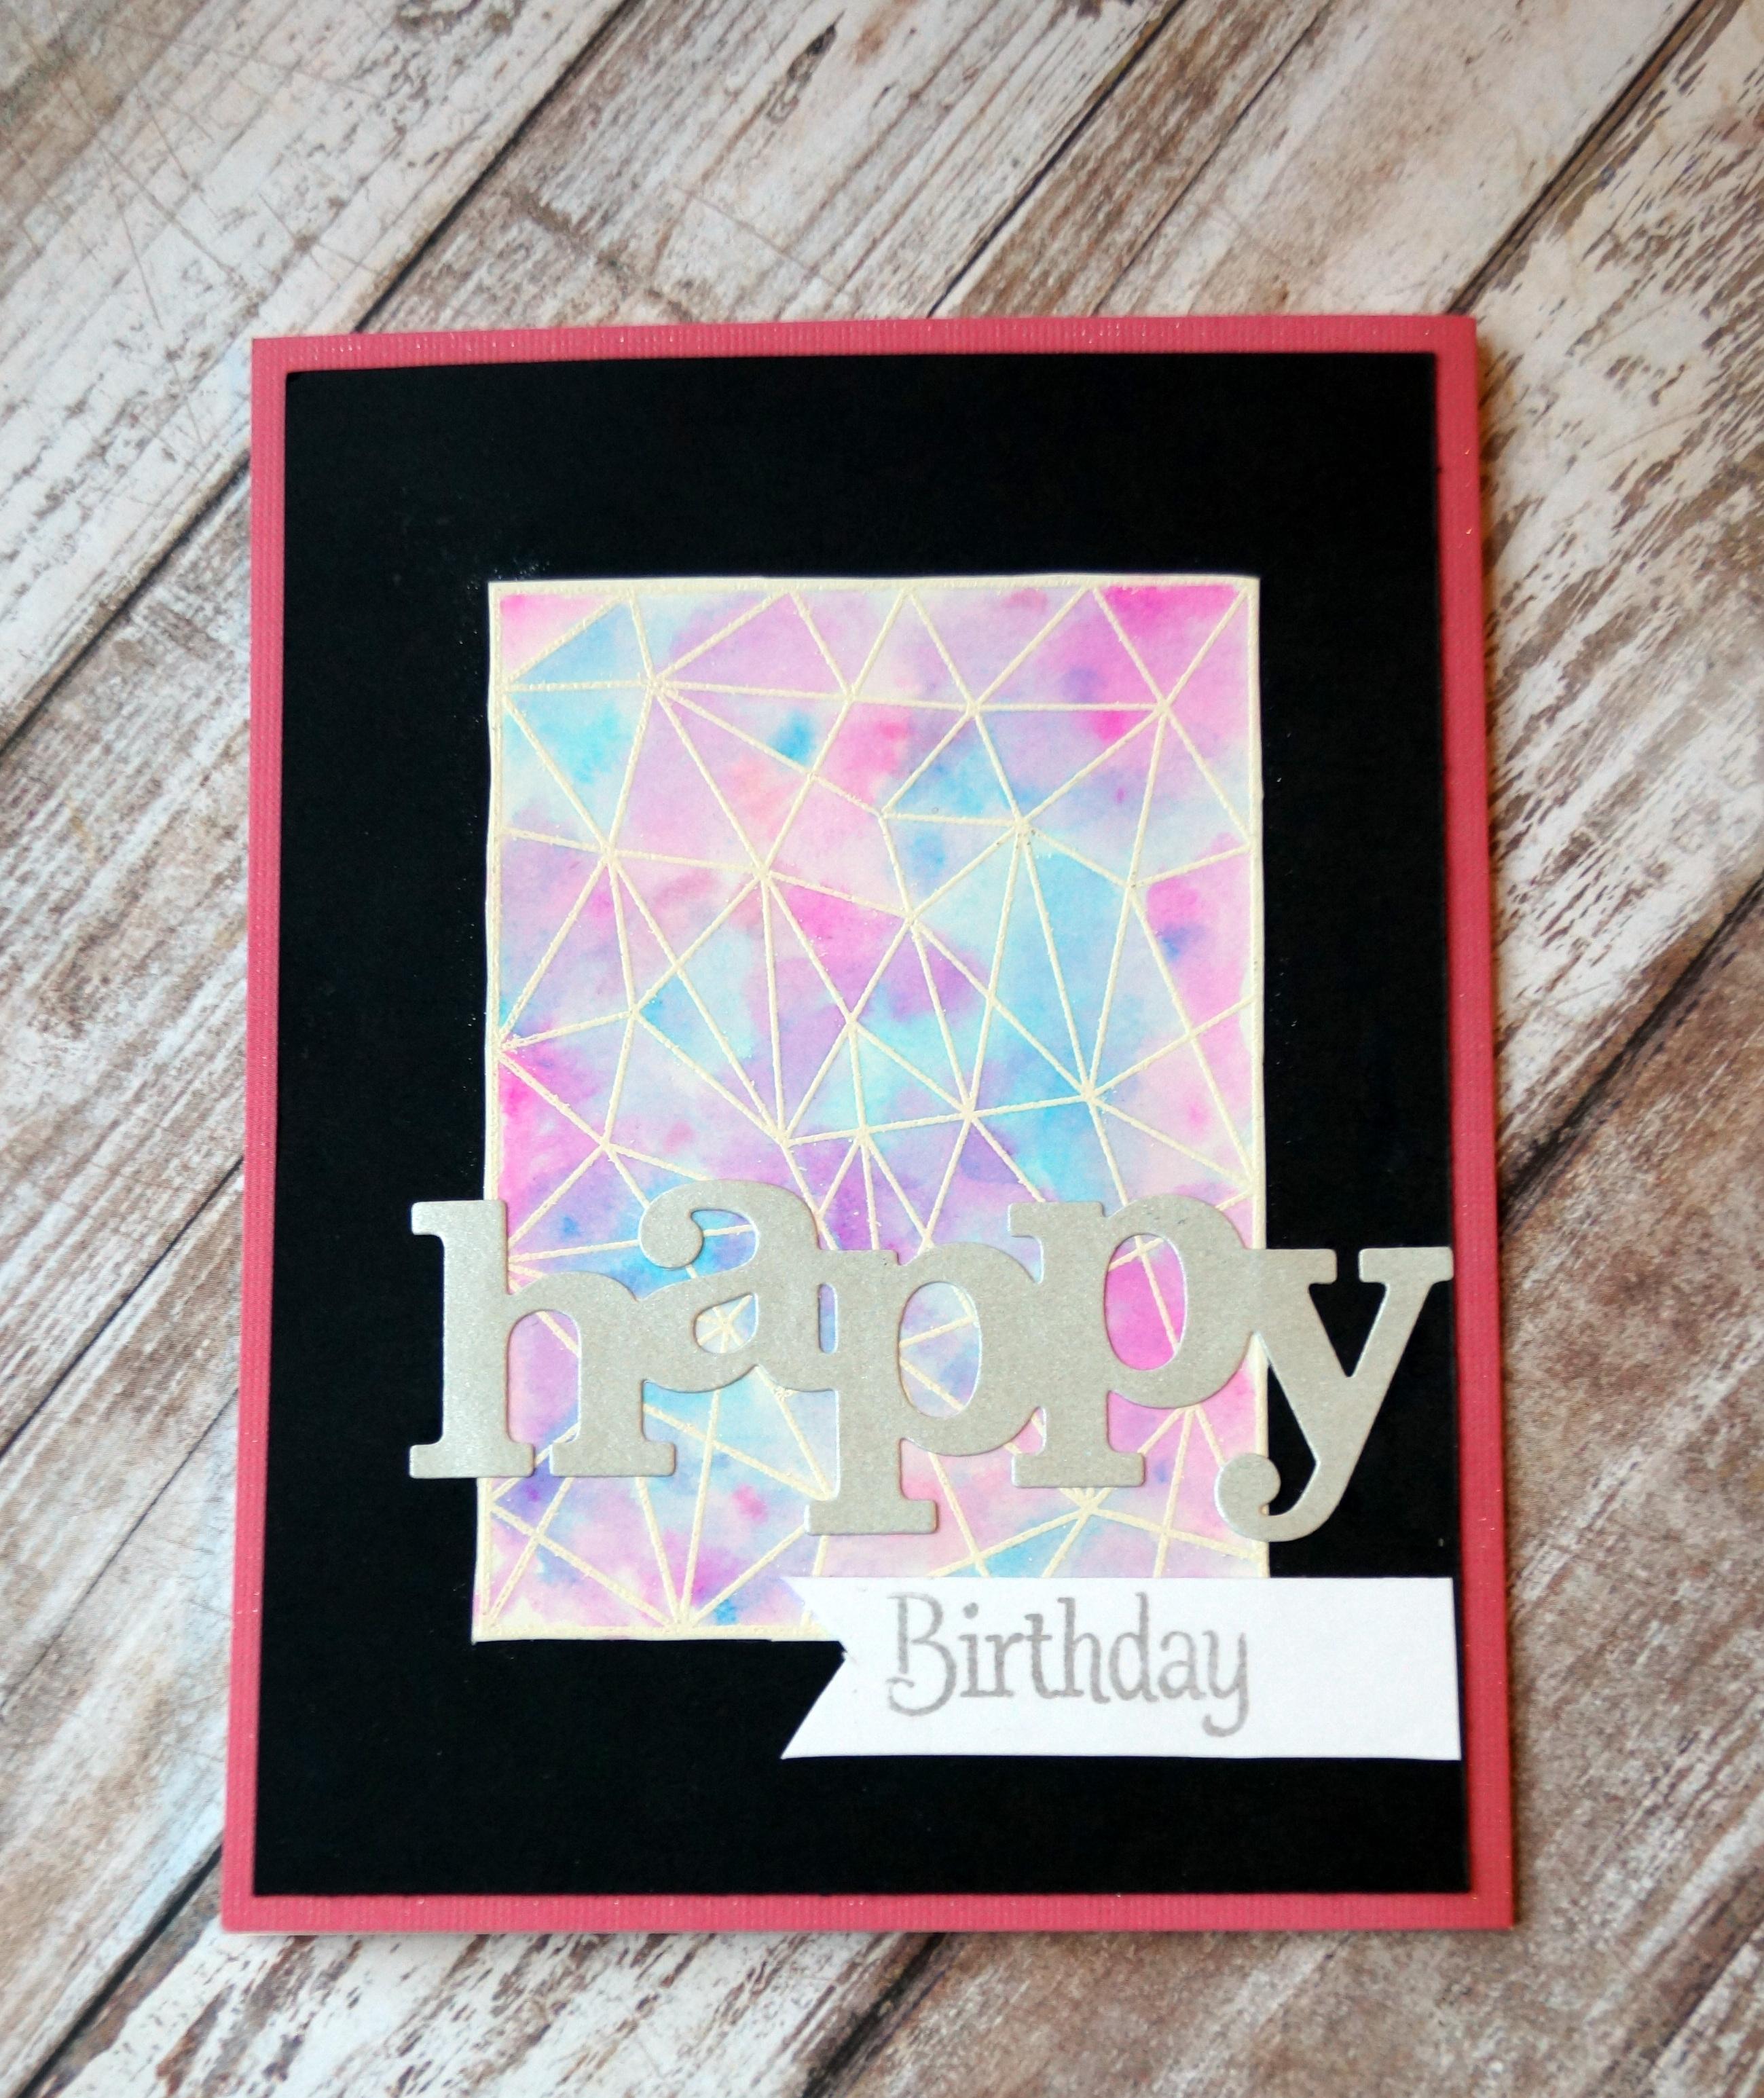 Happy Birthday W&W teen card